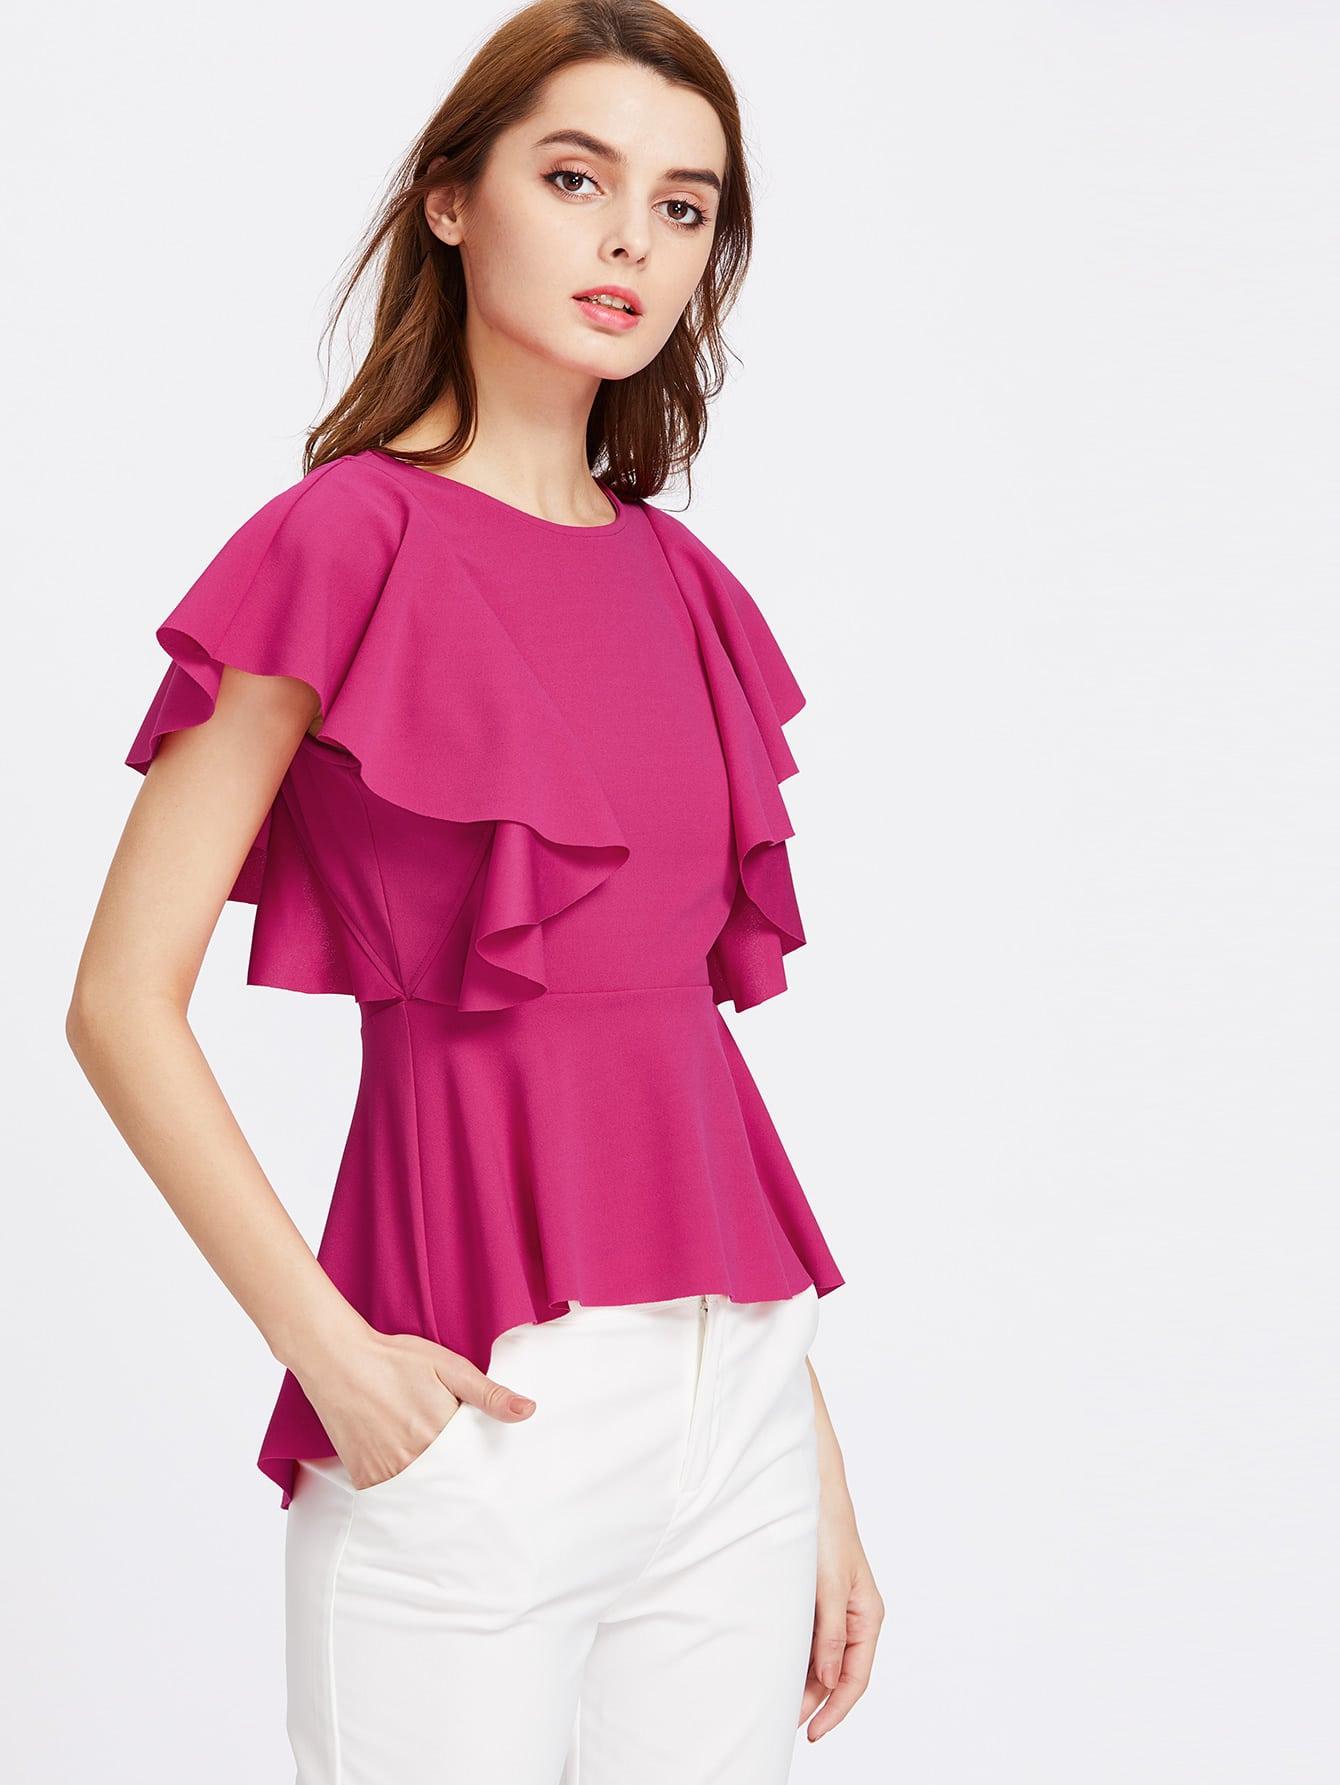 blouse170420707_2